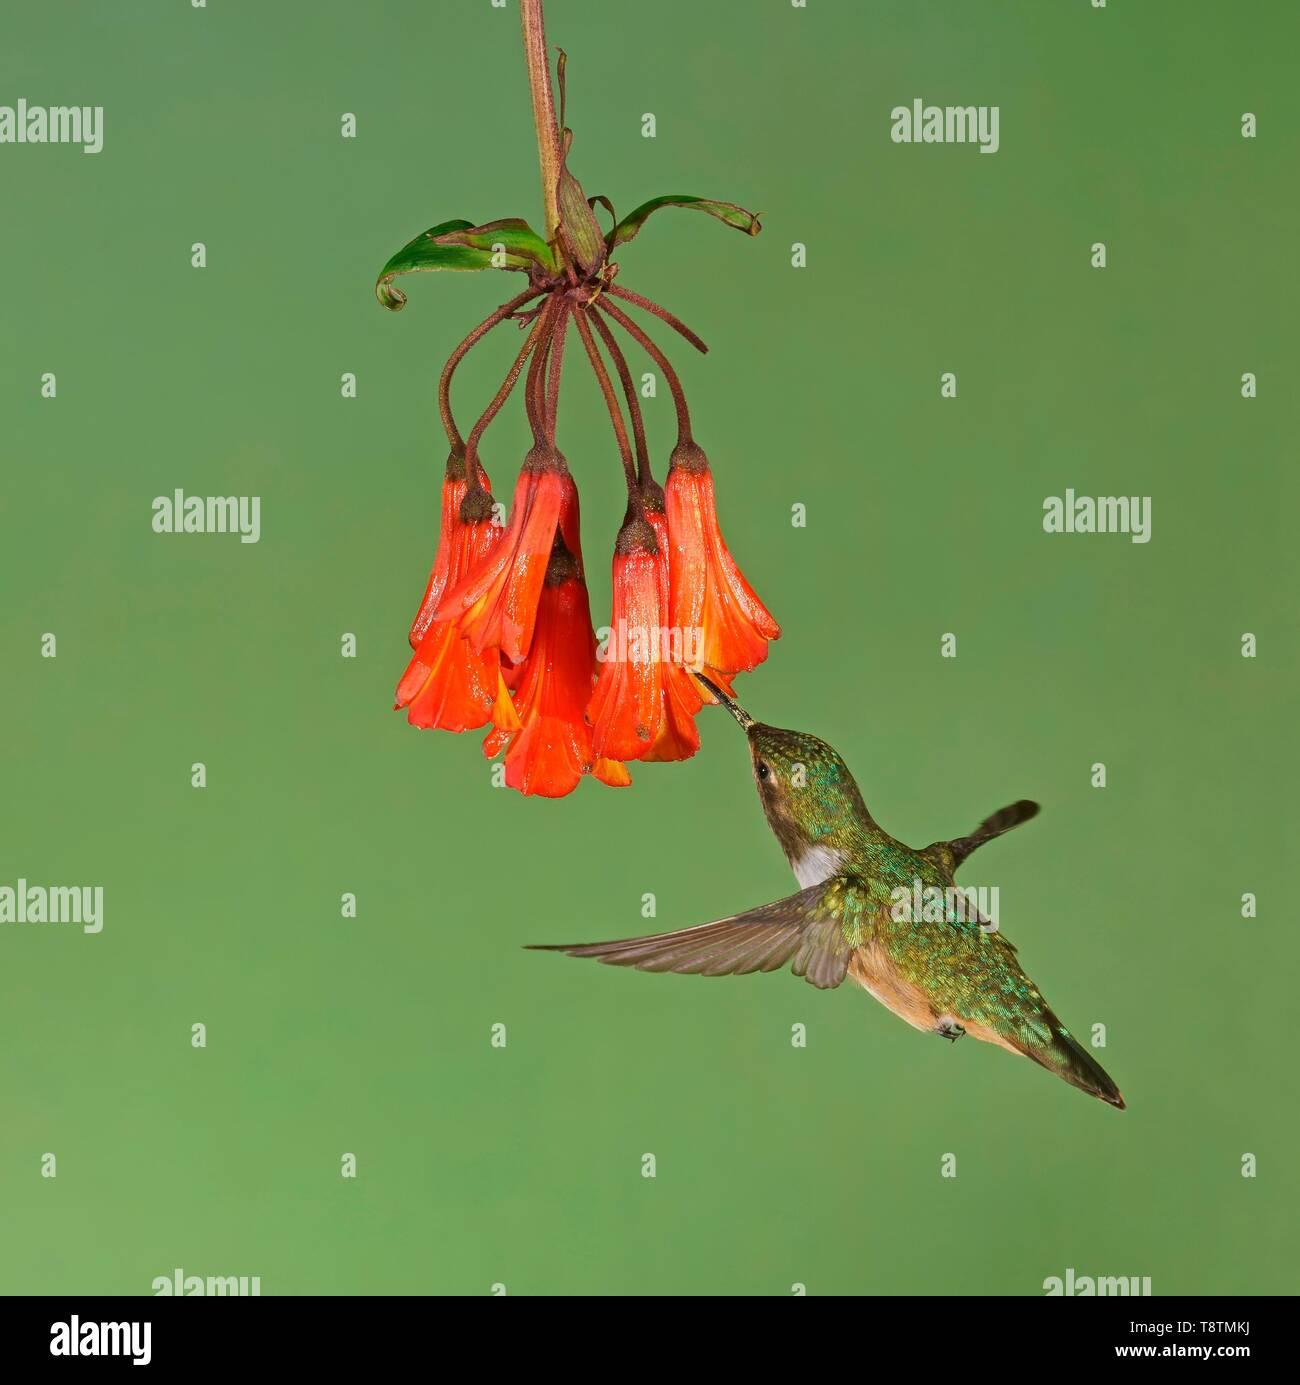 Volcanic elf (Selaphorus flammula) in flight, drinking nectar on a red flower, Costa Rica - Stock Image